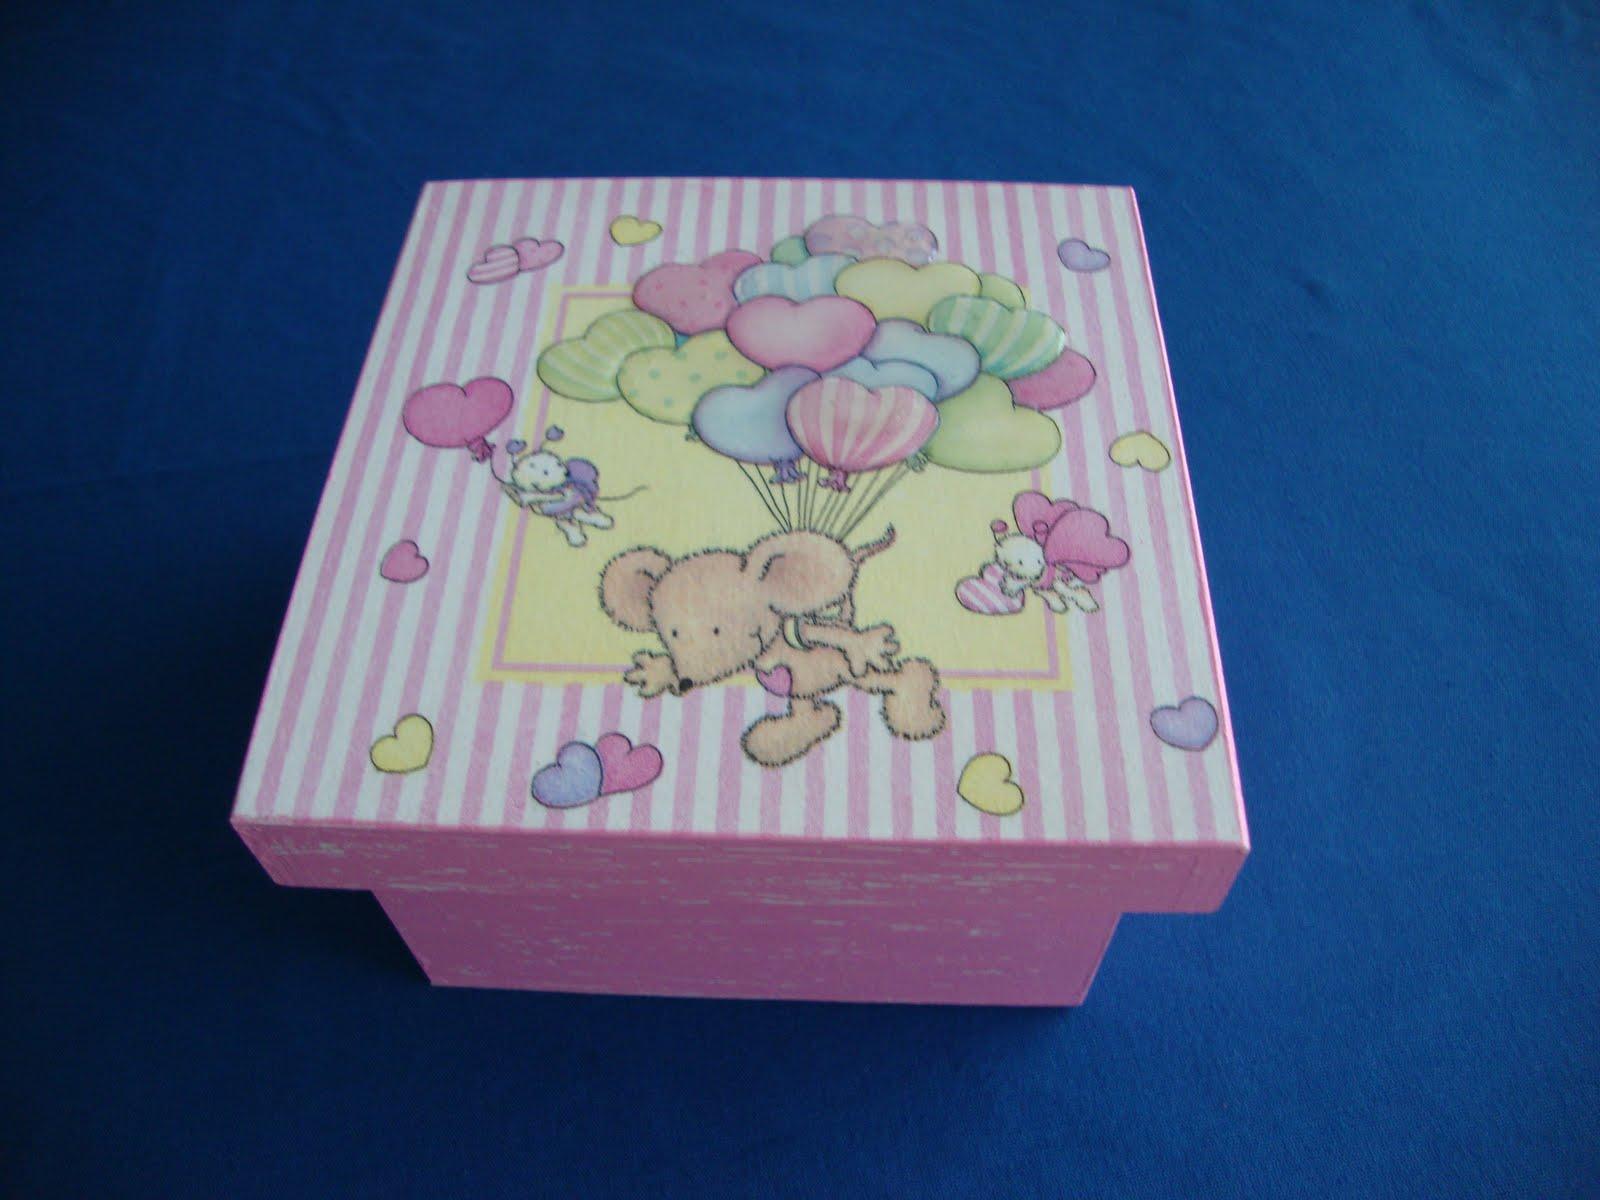 Tintas & Guardanapos: Caixas de madeira para bebés #04193C 1600x1200